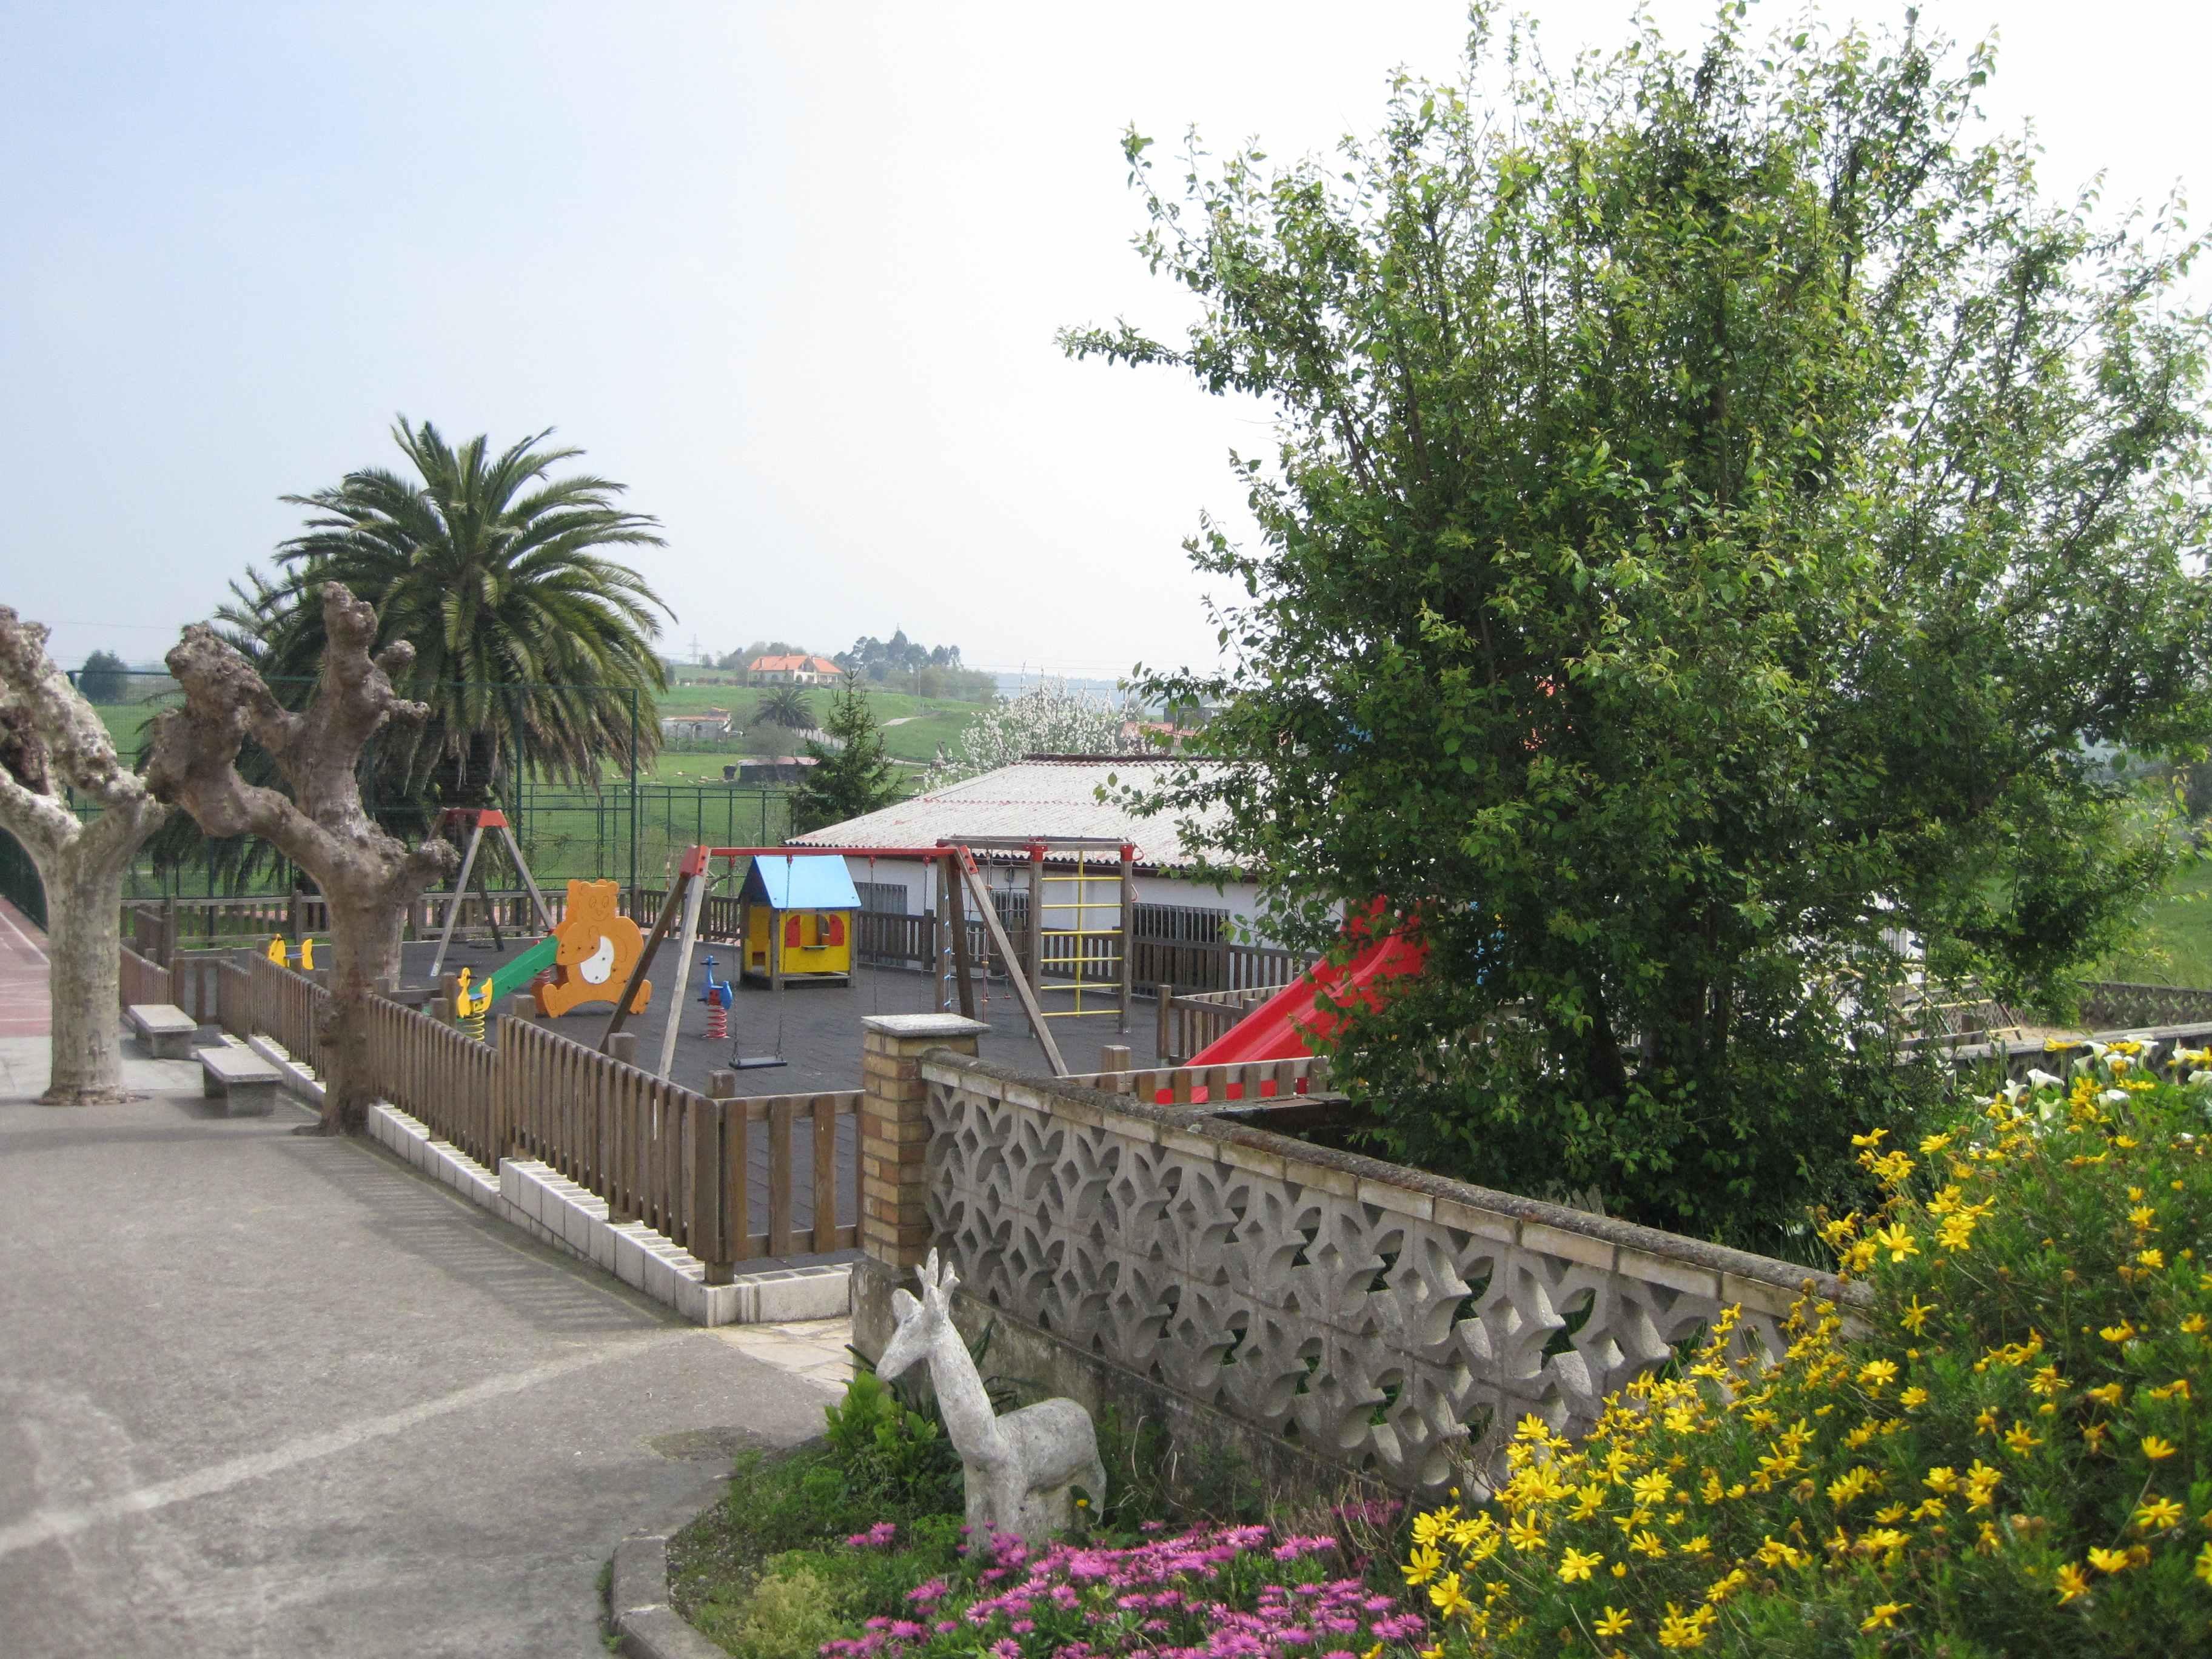 Colegios en Polanco Torrelavega Colegio la MIlagrosa